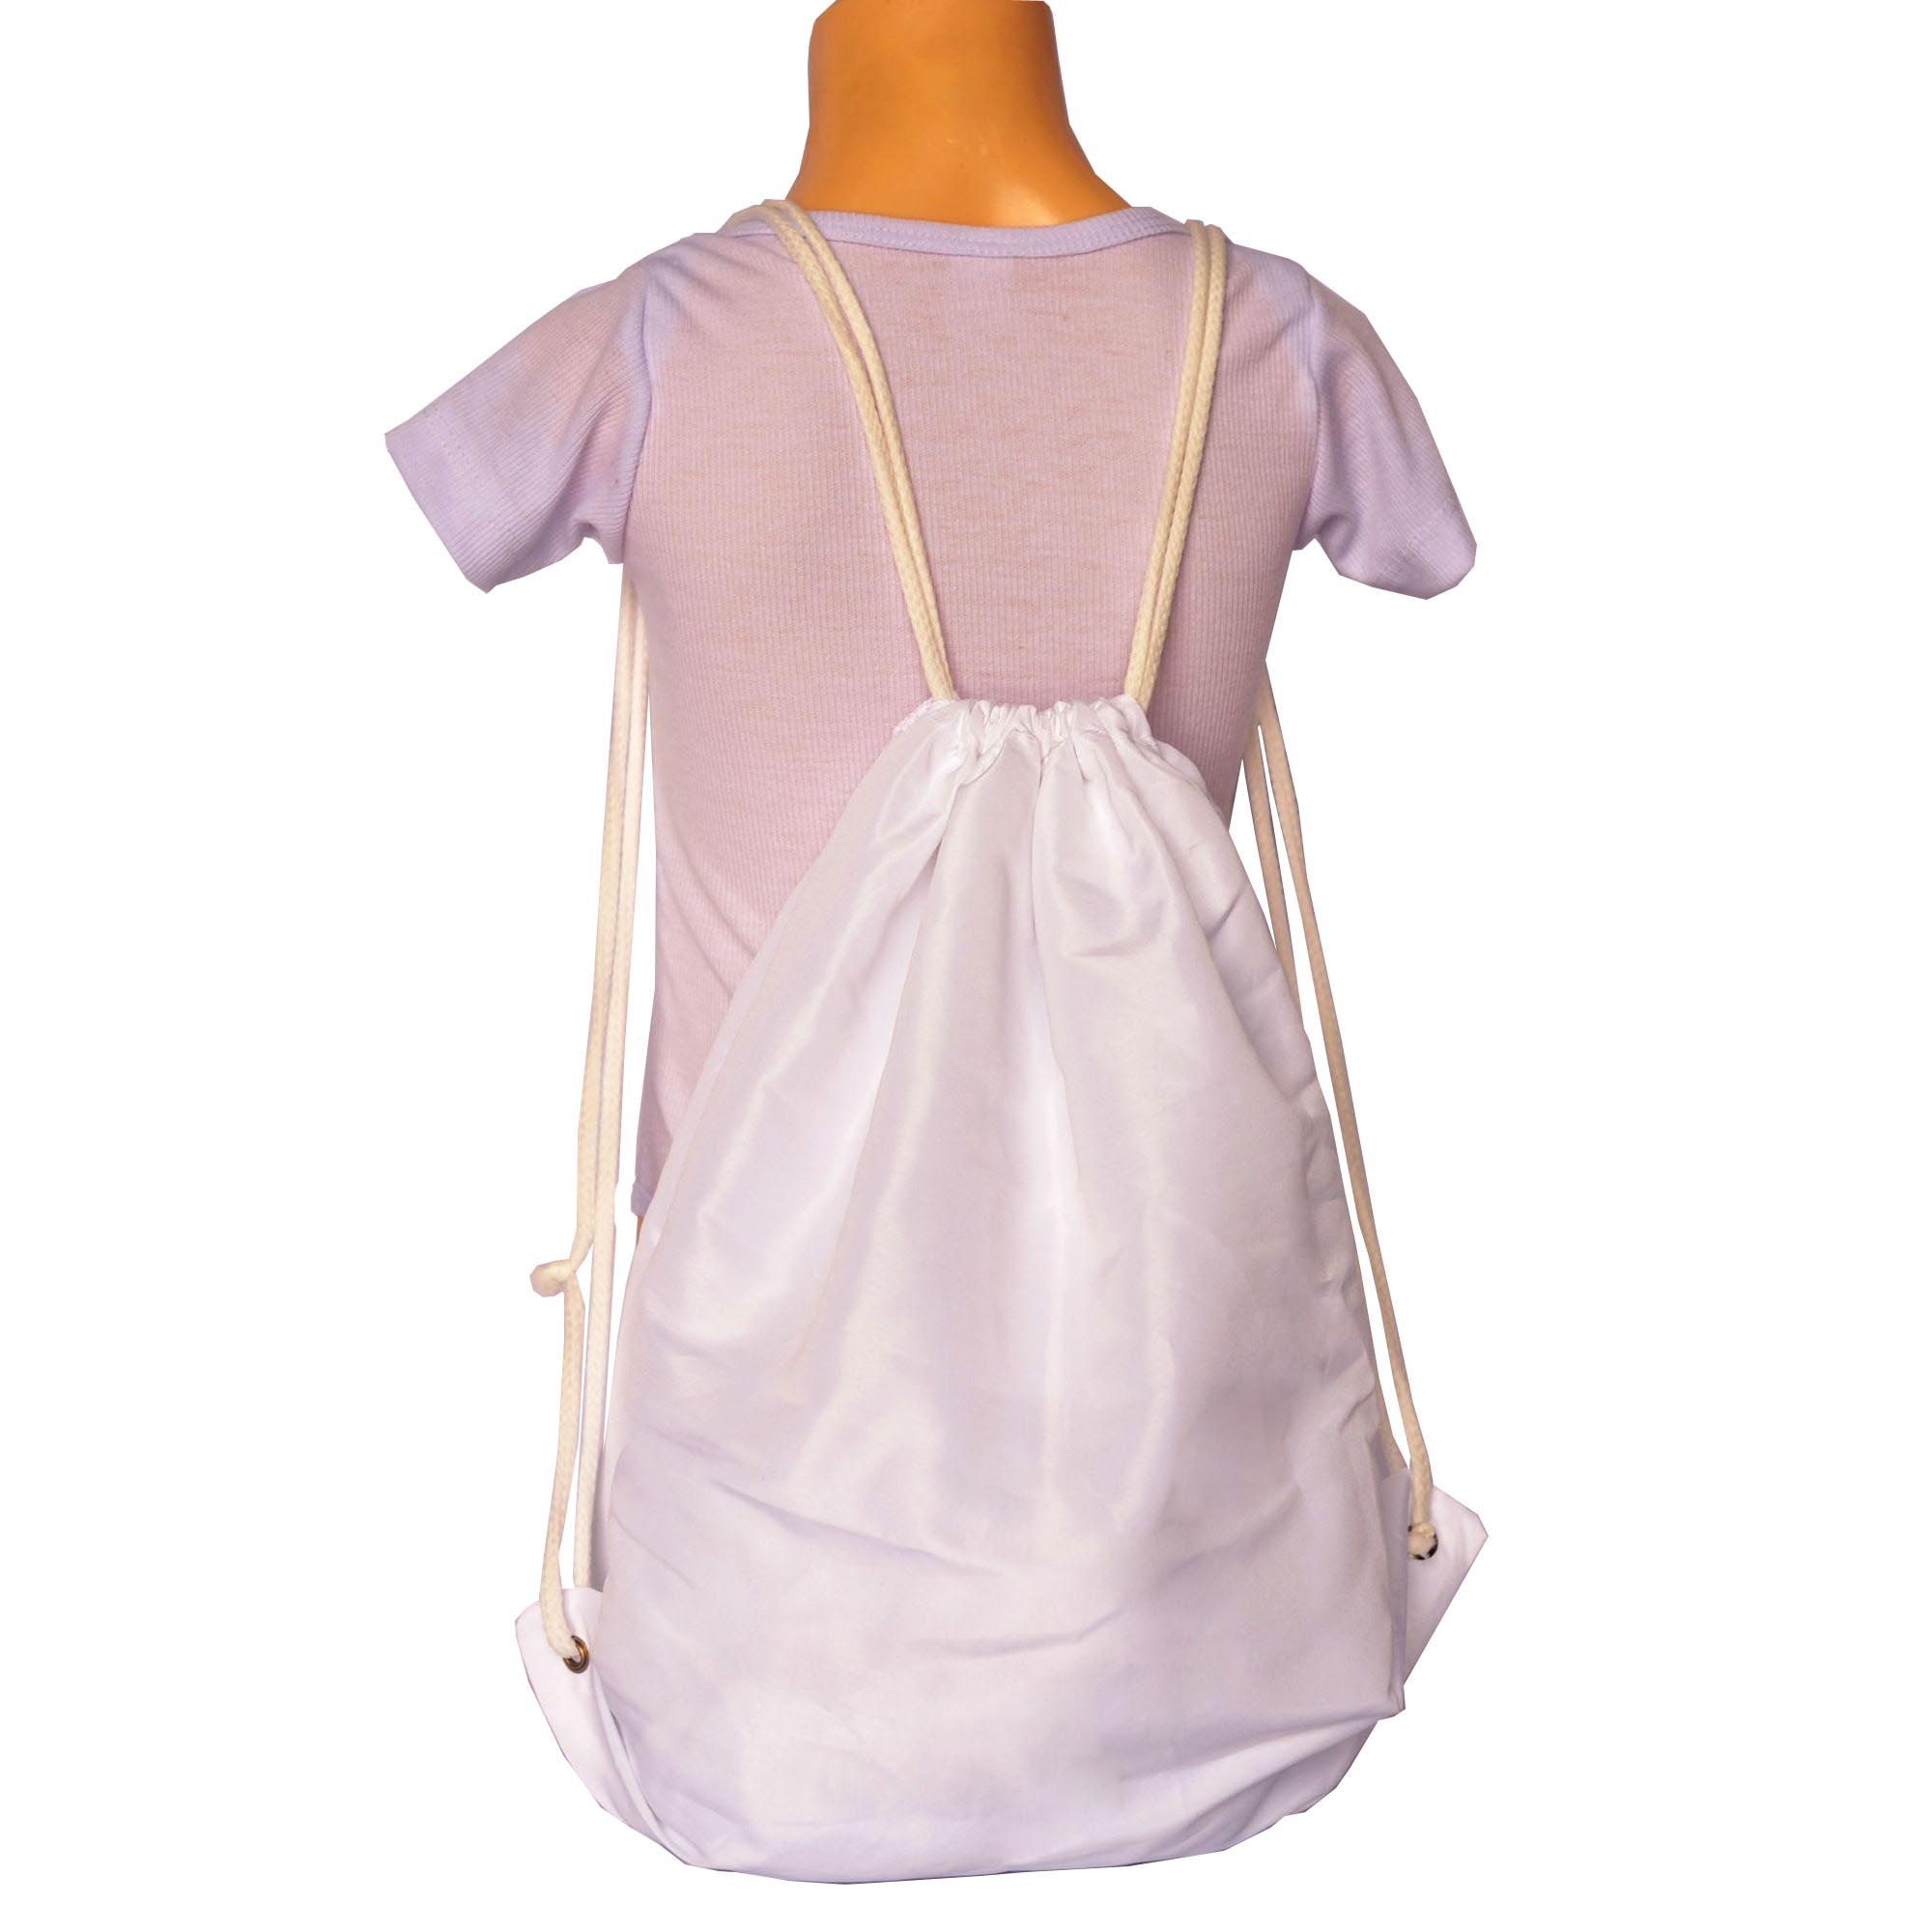 Bolsa toalha Branca - Pra Sublimar 4b40940553d